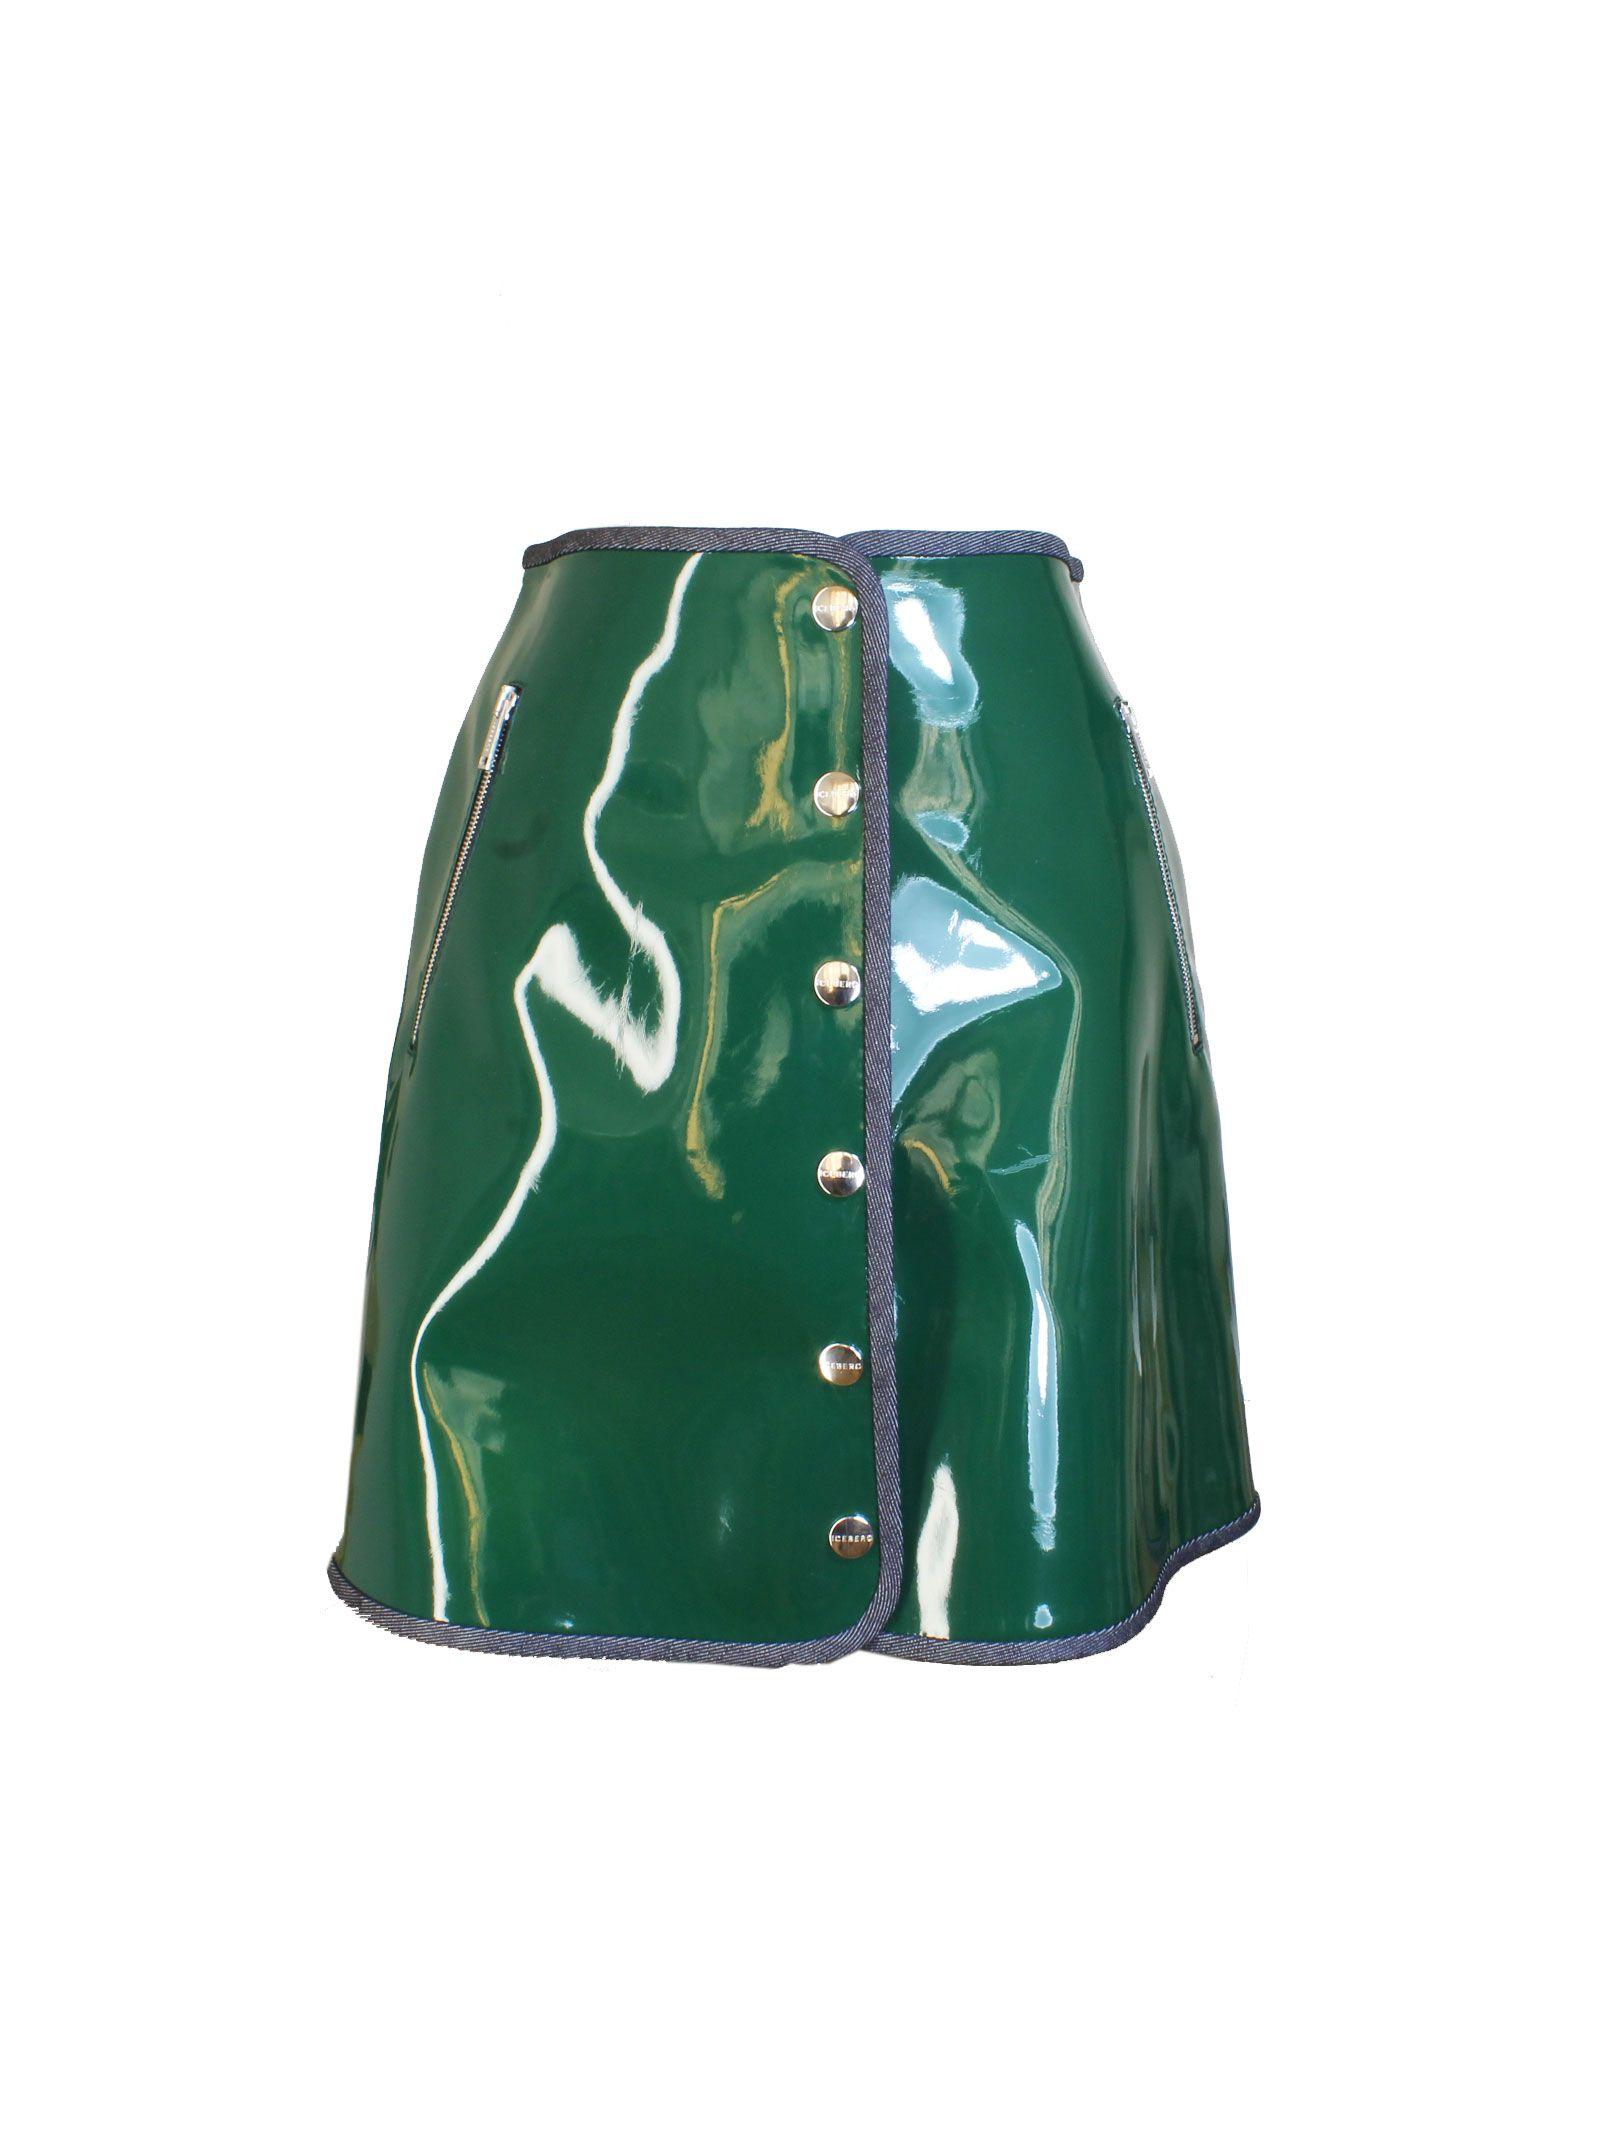 Green Patent Leather Mini Skirt - Iceberg - Circus